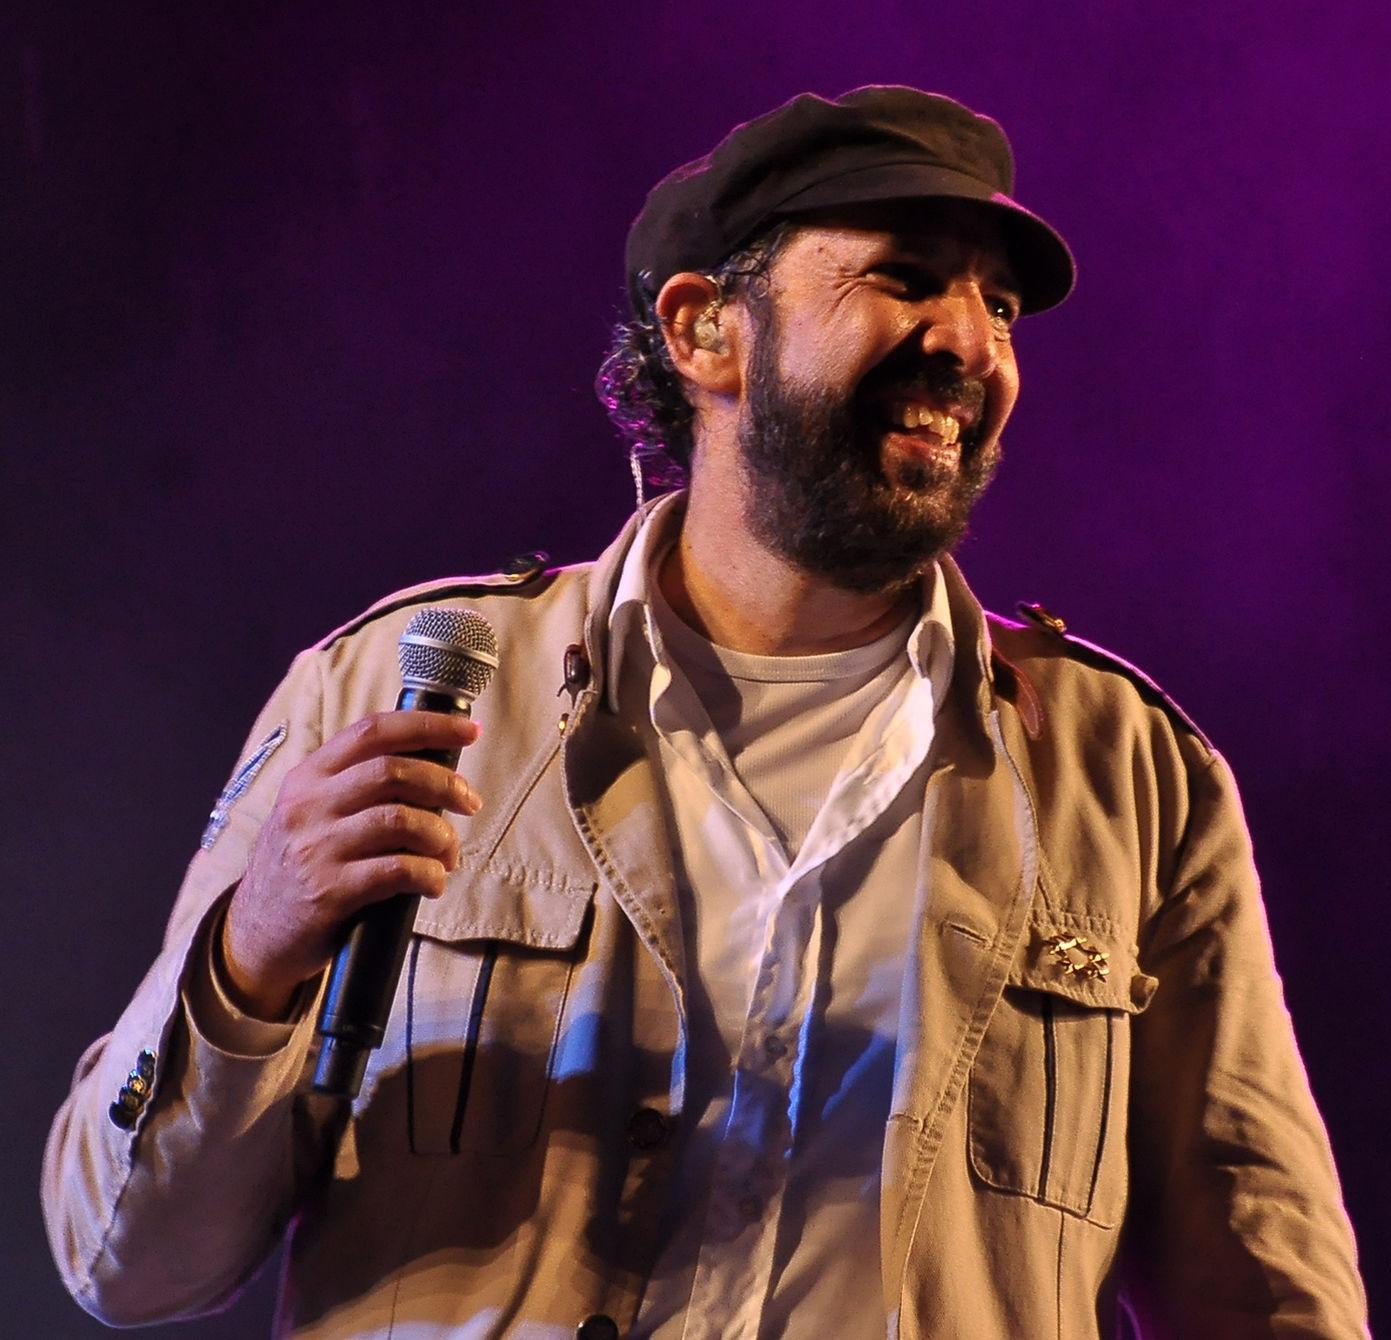 Photo of Juan Luis Guerra: Dominican Republic musician